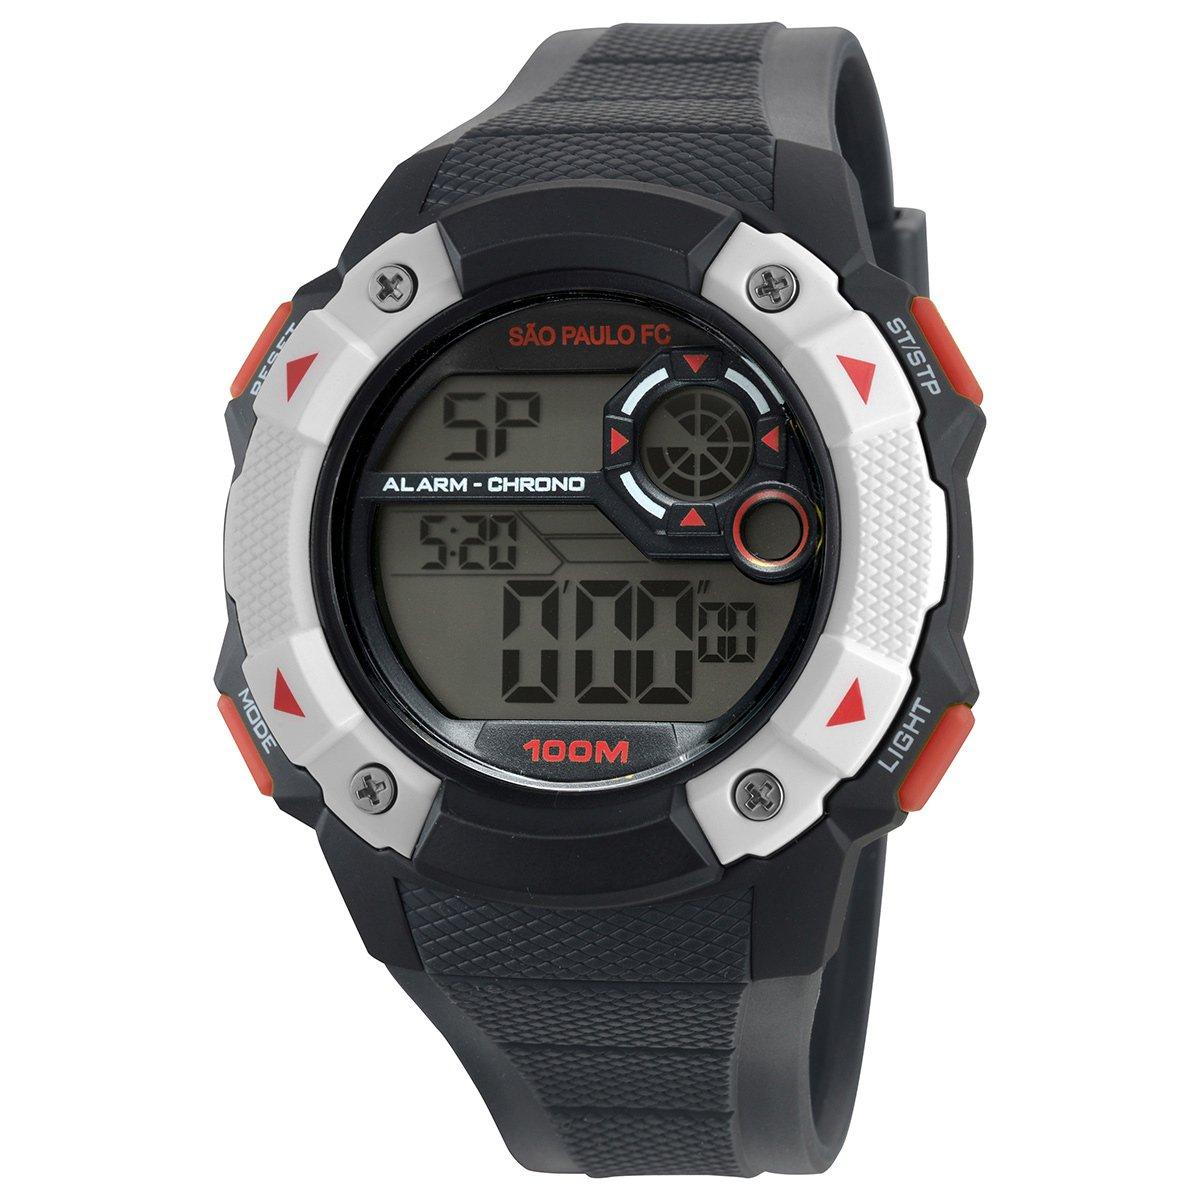 121519a5baa Relógio São Paulo Technos Digital II - Compre Agora